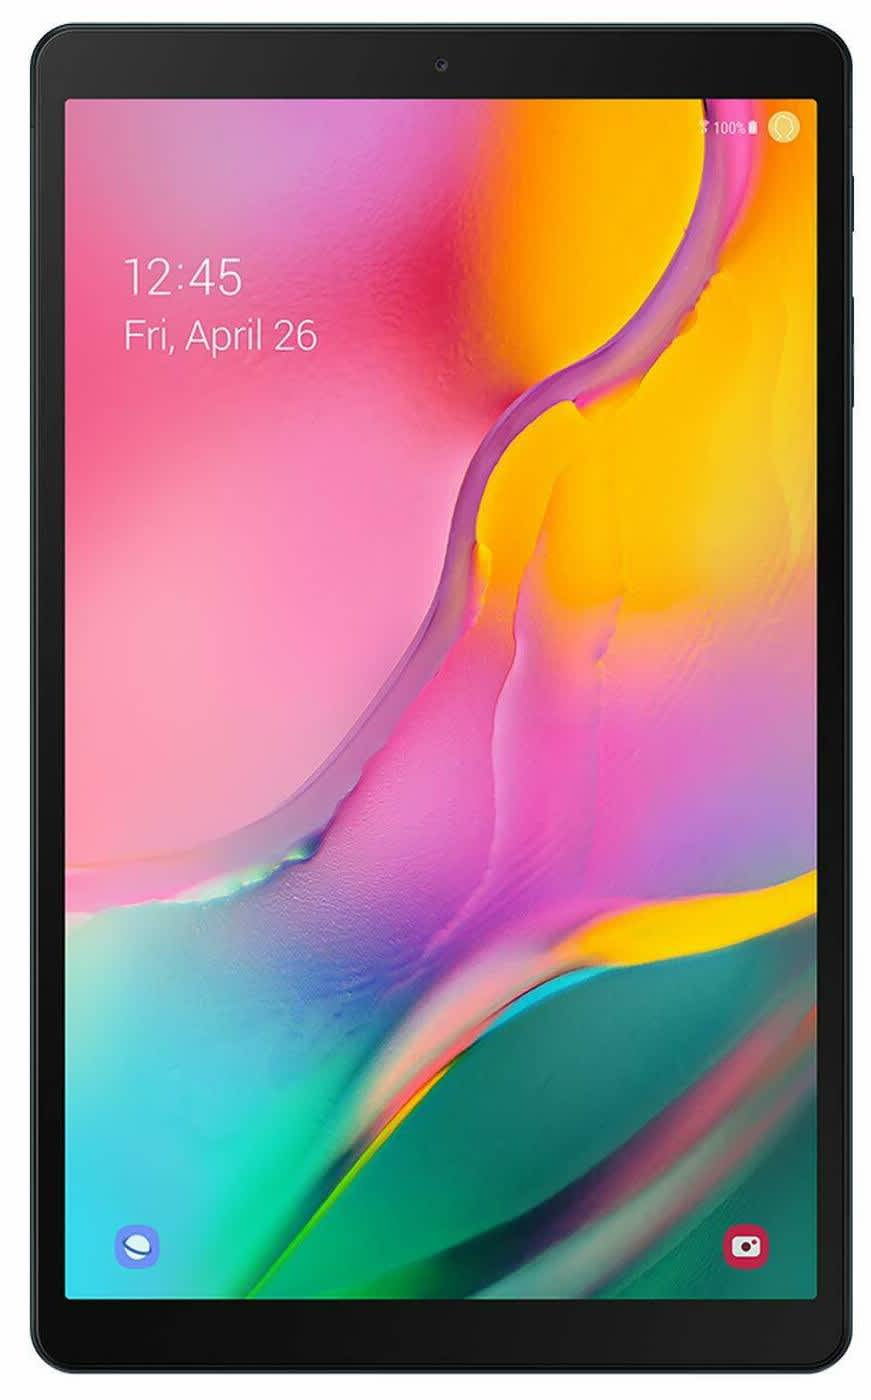 "Refurb Samsung Galaxy Tab A 10.1"" 32GB Android Tablet"